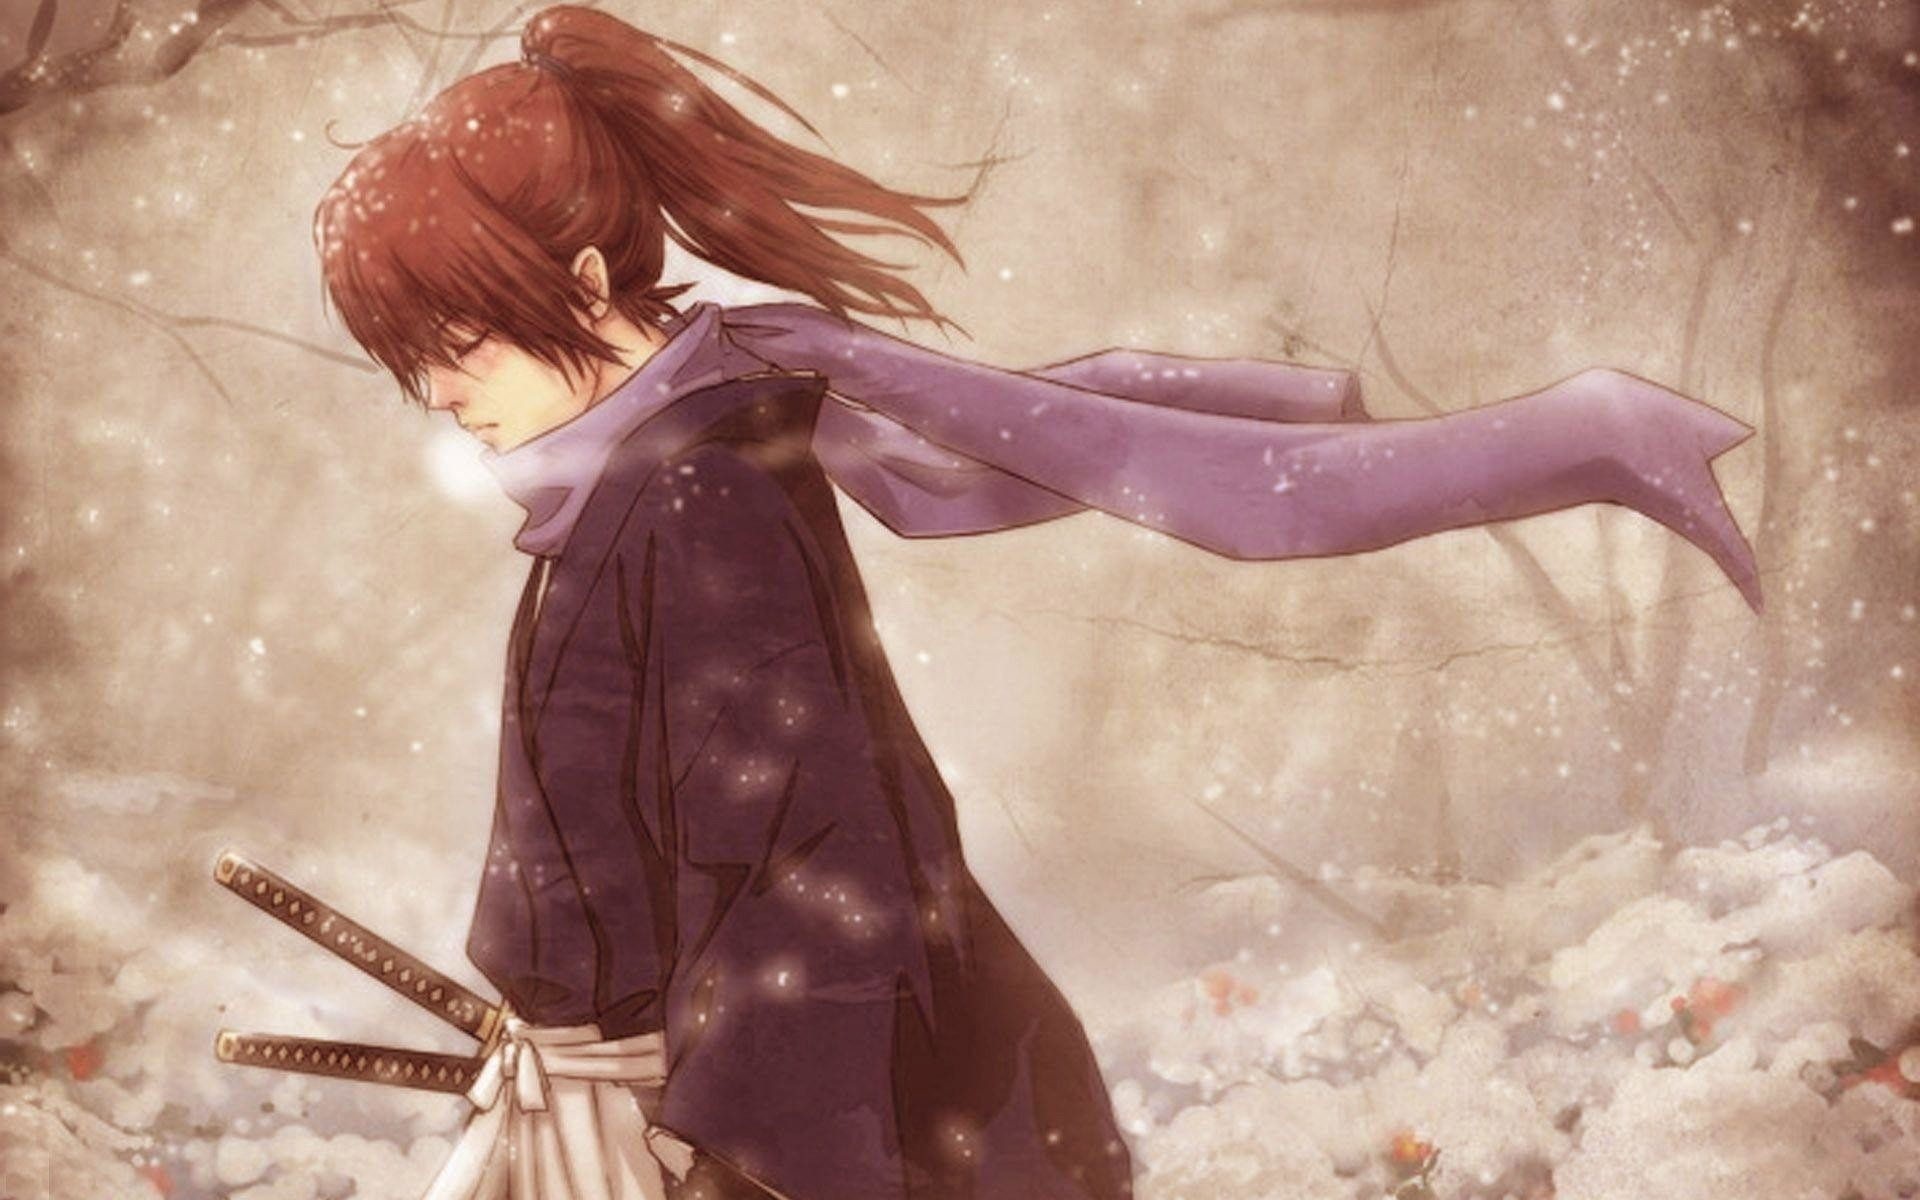 Rurouni Kenshin Wallpaper HD For Android – cartoon Hd wallpapers